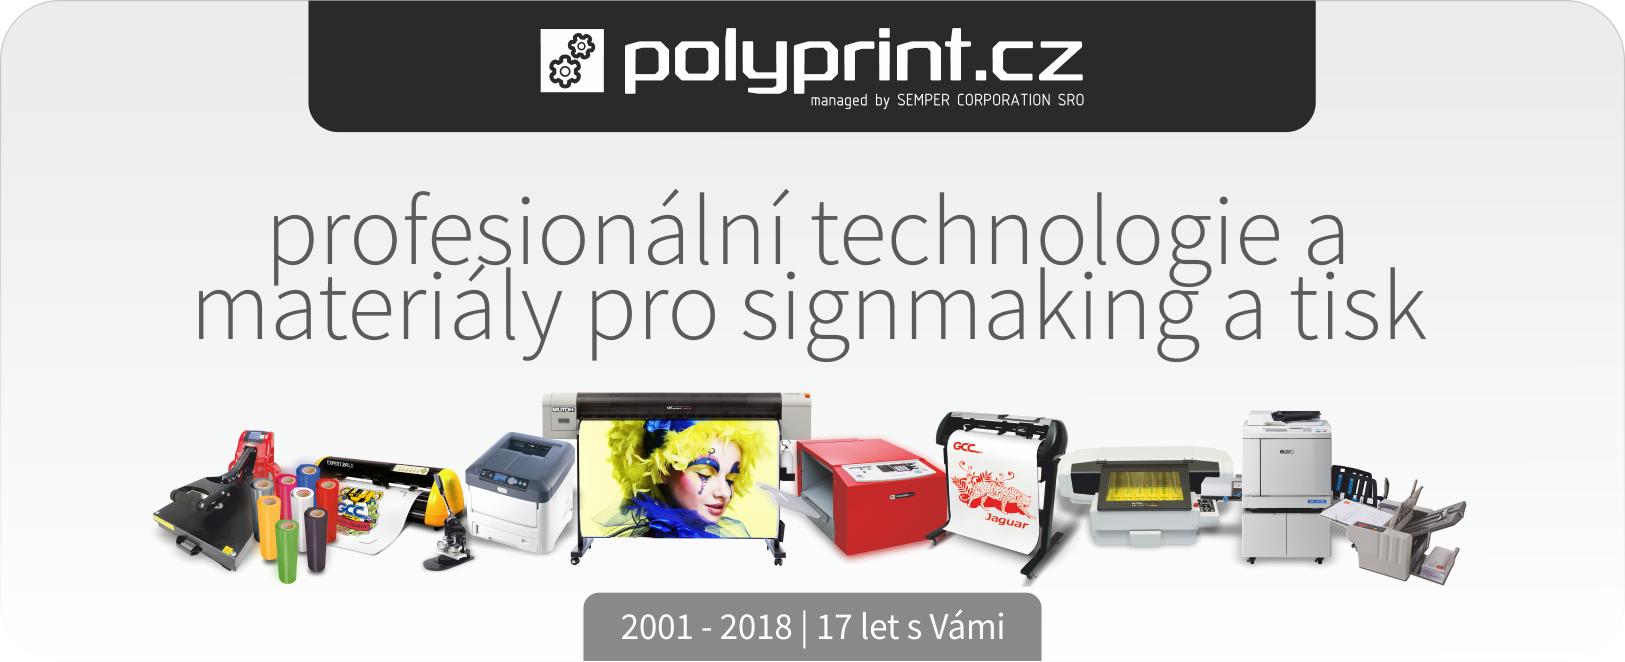 www.polyprint.cz | SEMPER CORPORATION SRO